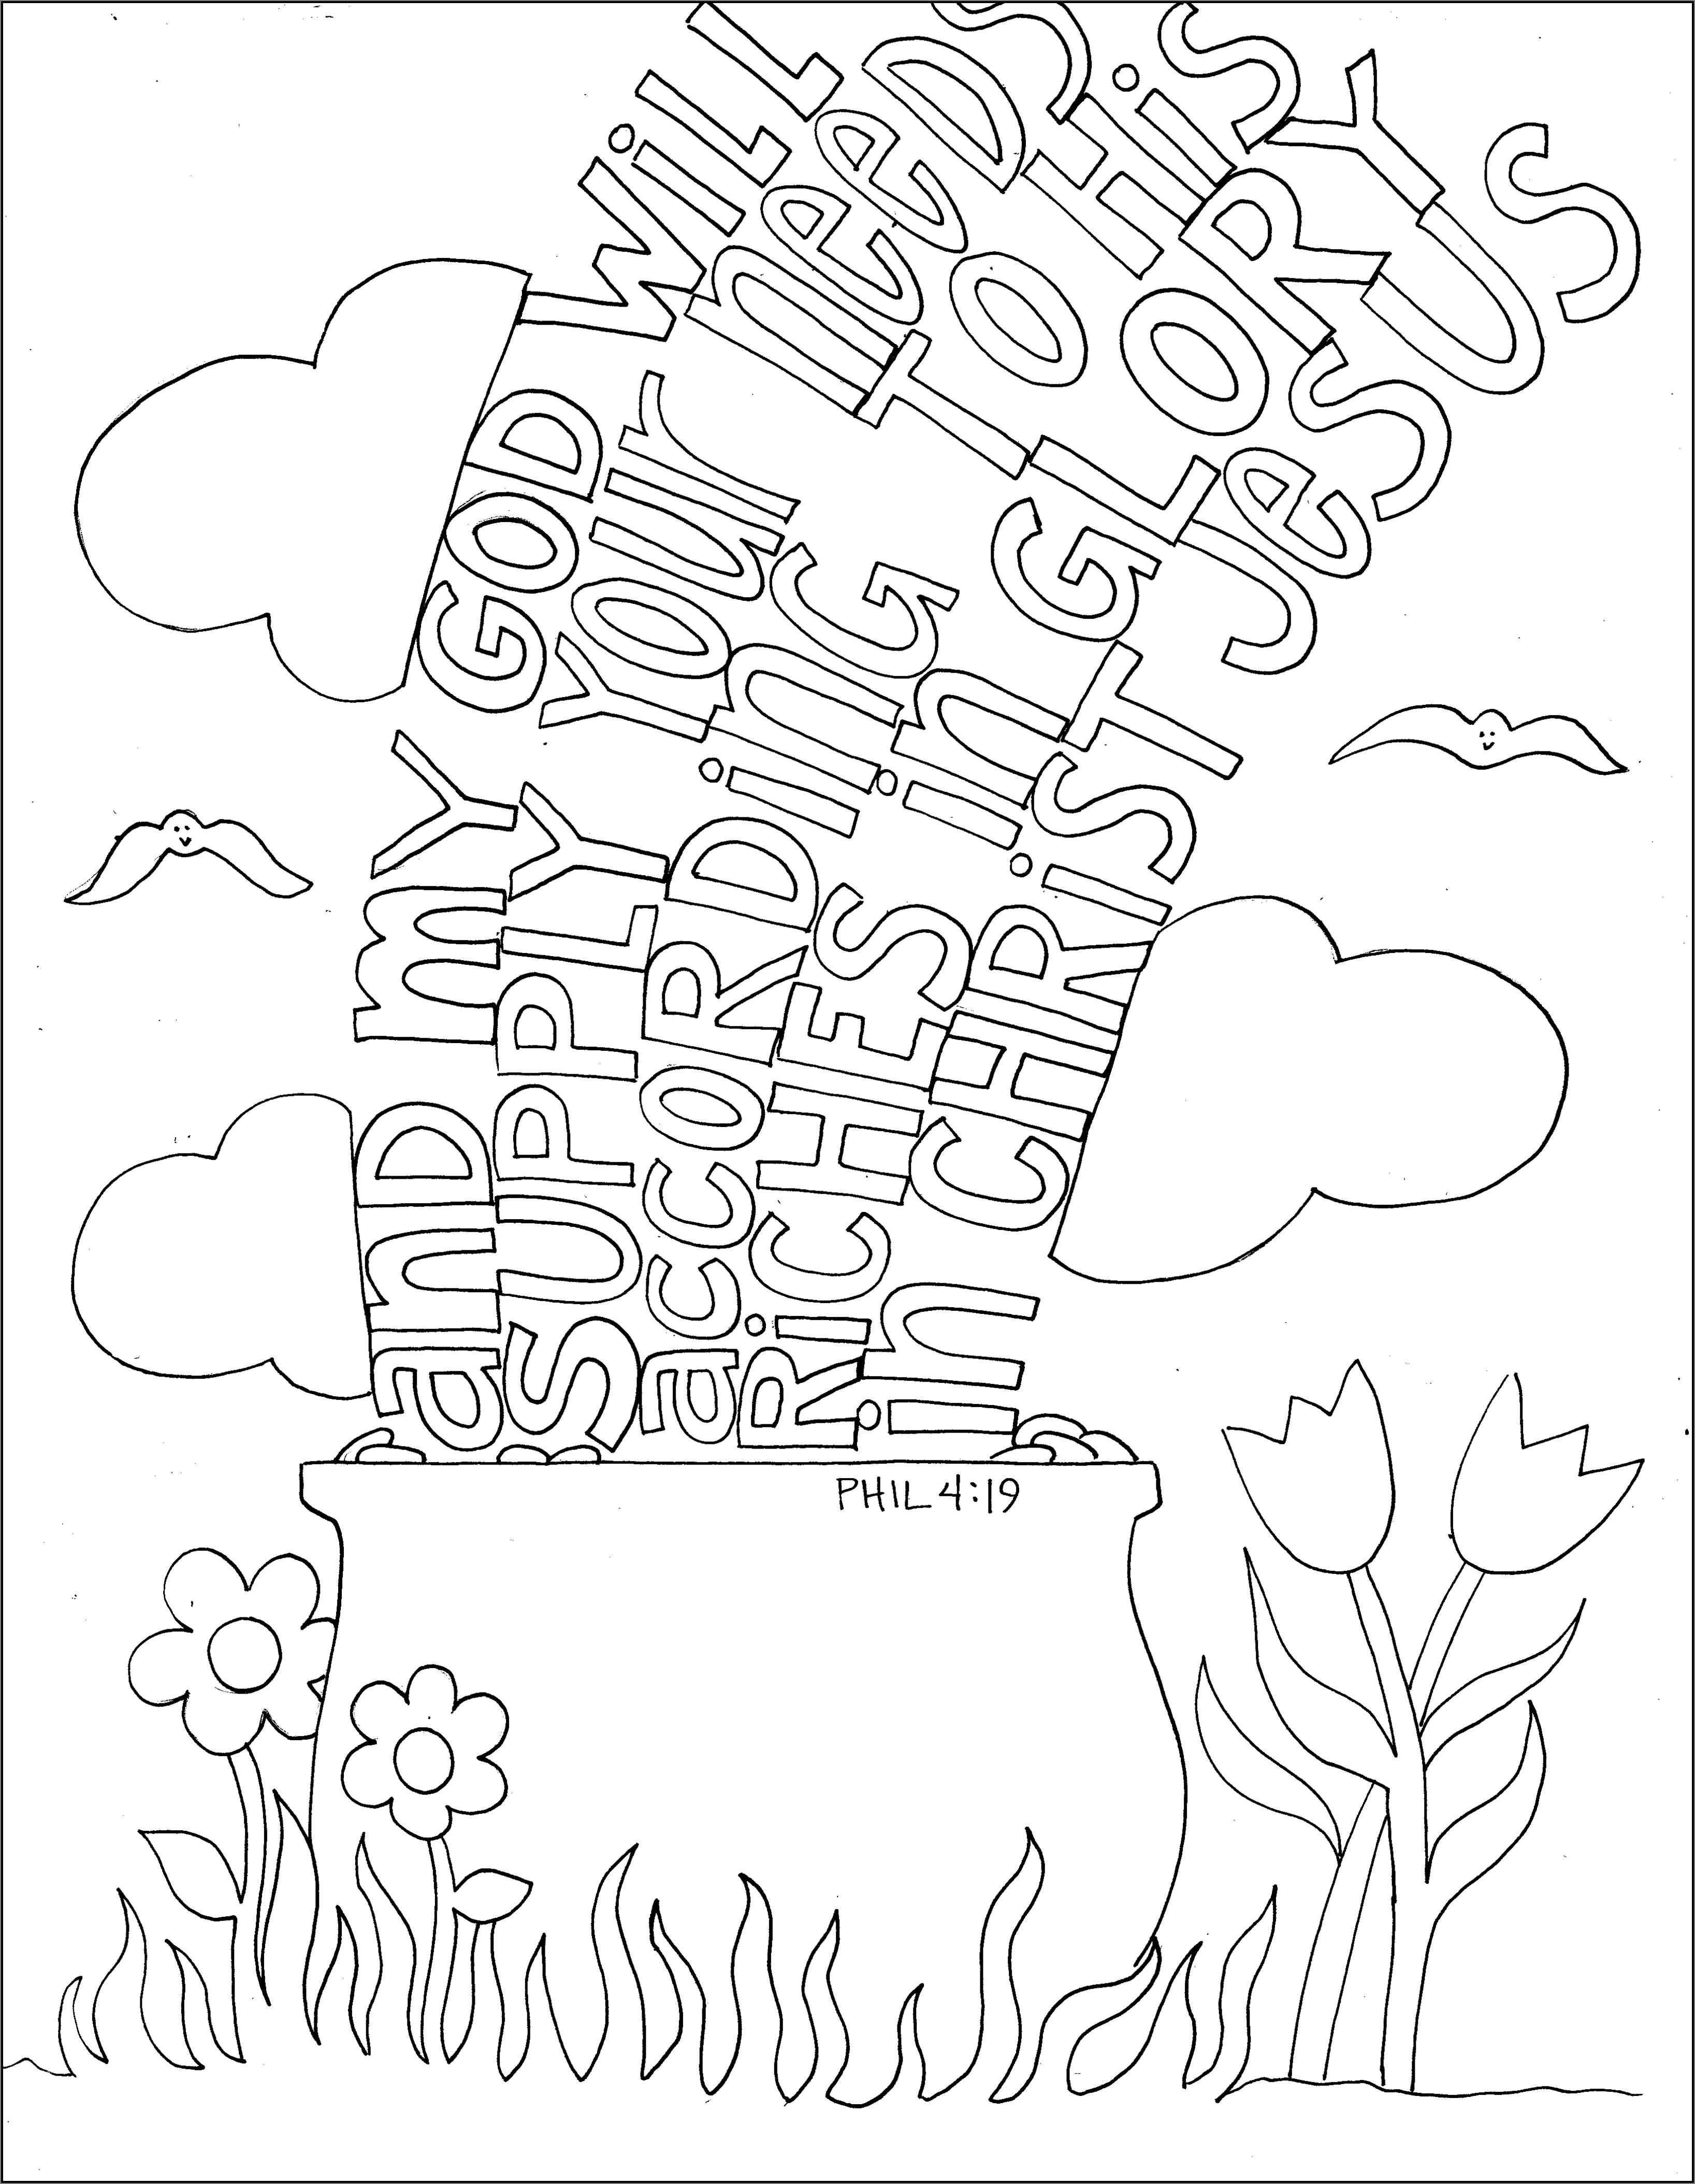 Phil 4.19 | Whole Hearted Children | Pinterest | Mandalas